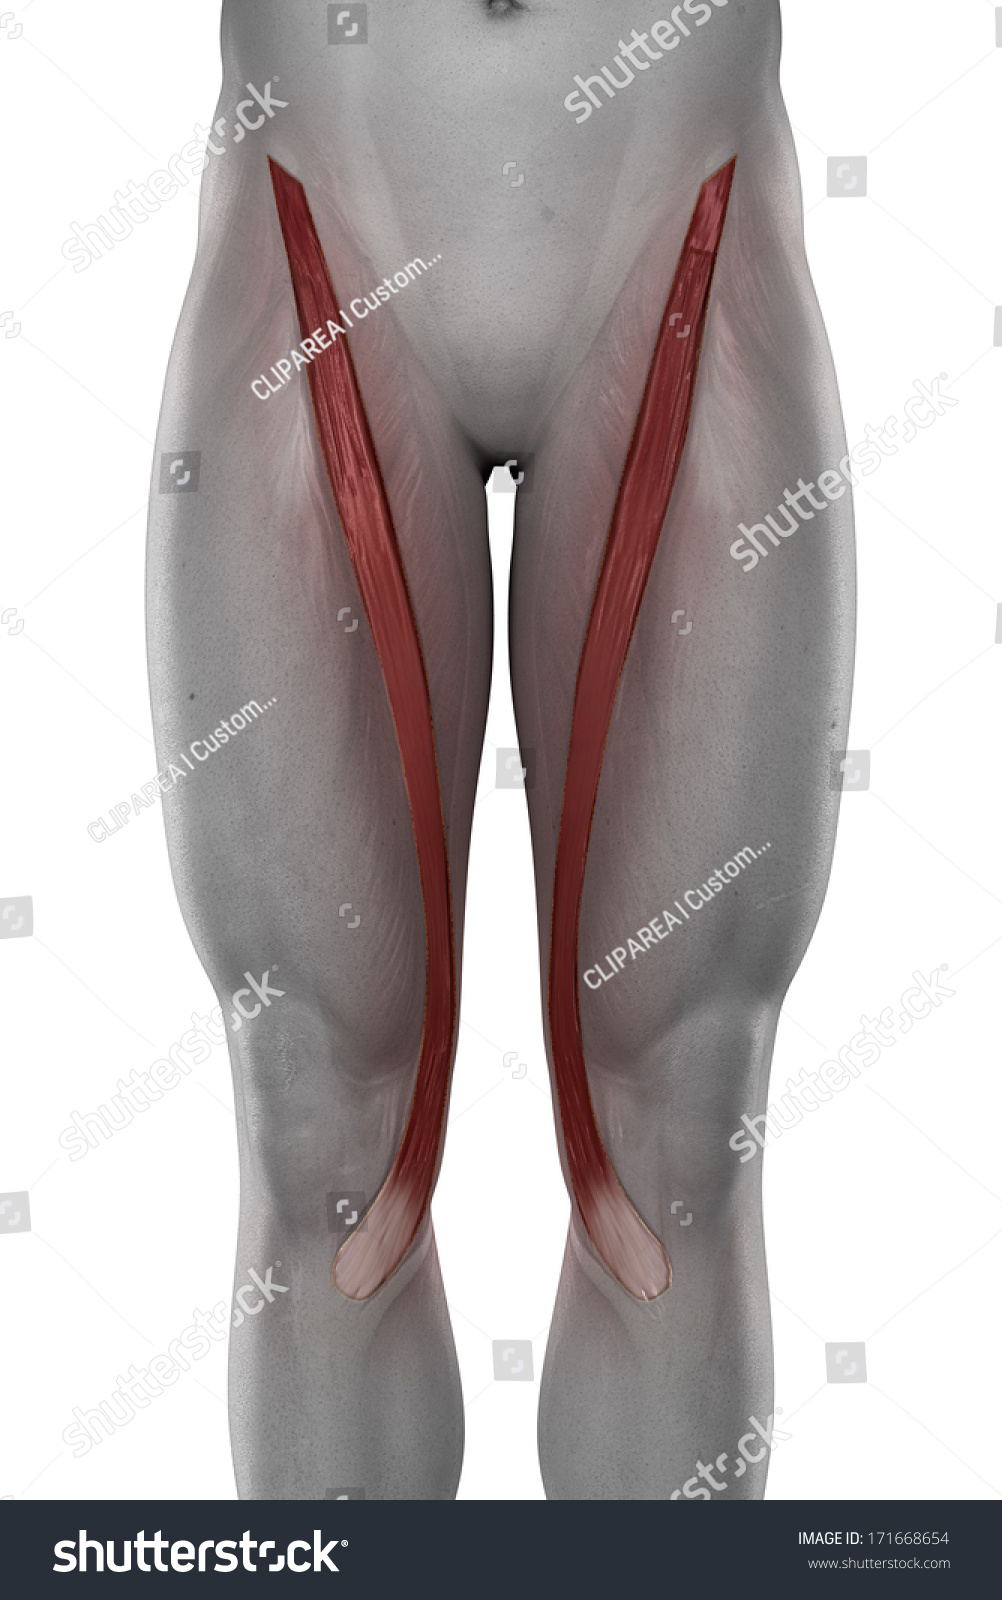 Sartorius Male Muscles Anatomy Anterior View Stock Illustration ...